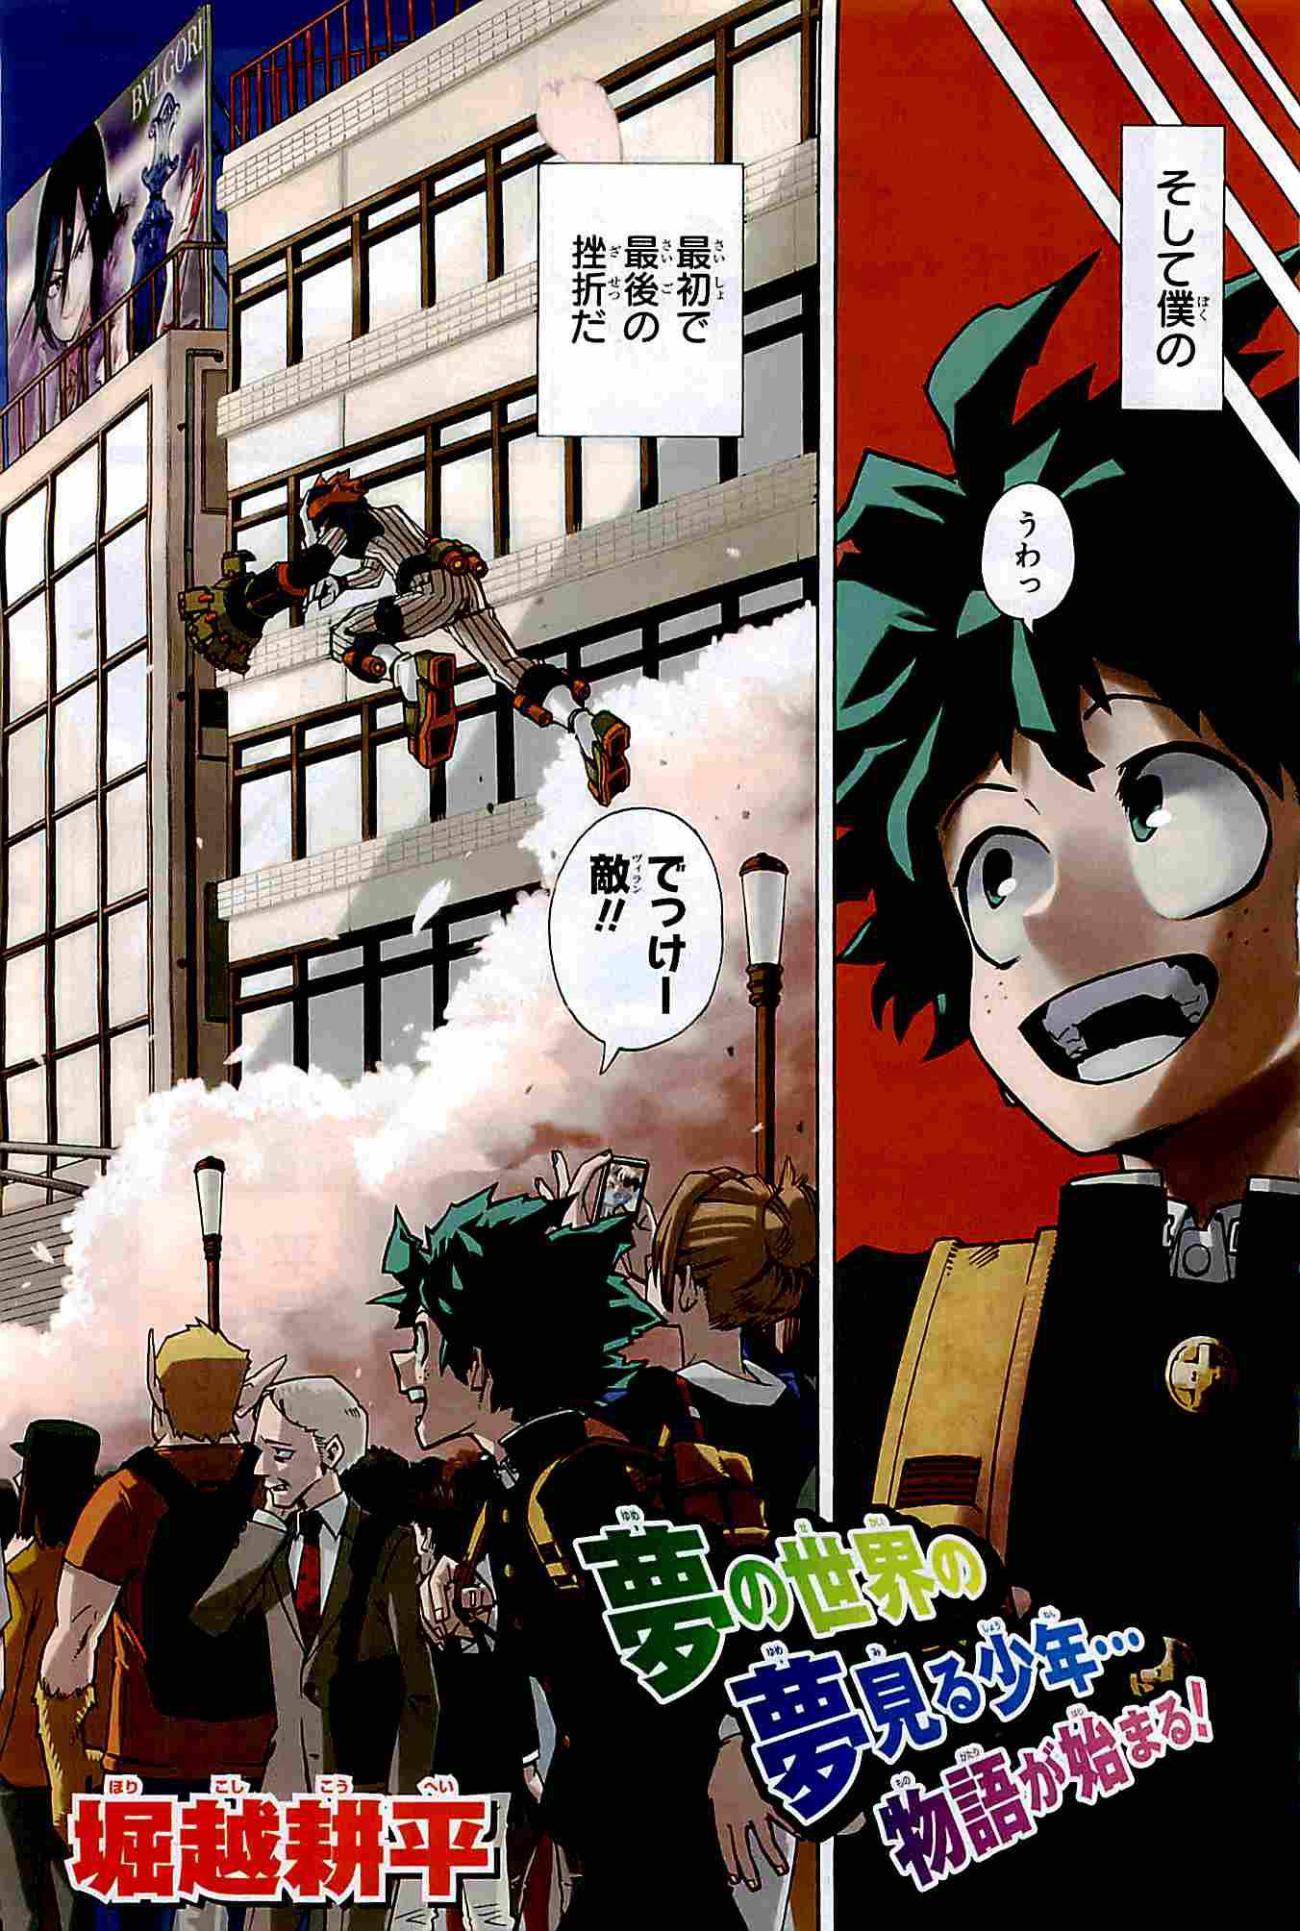 Hero Academia Weekly Shonen Jump 2014 #32 page 3